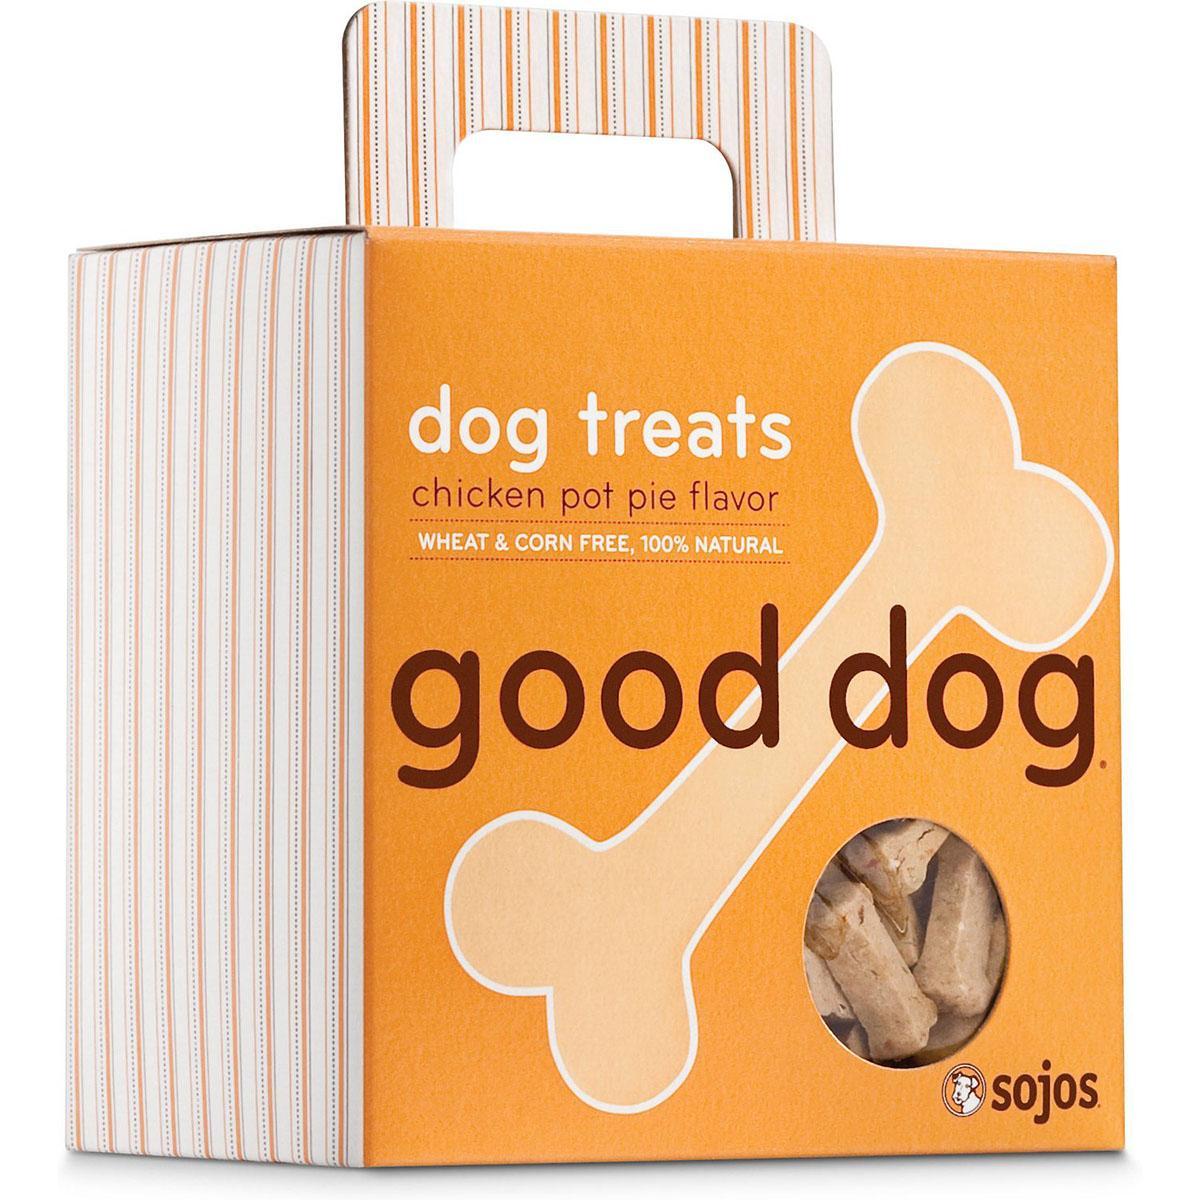 Sojos Good Dog Chicken Pot Pie Dog Treats